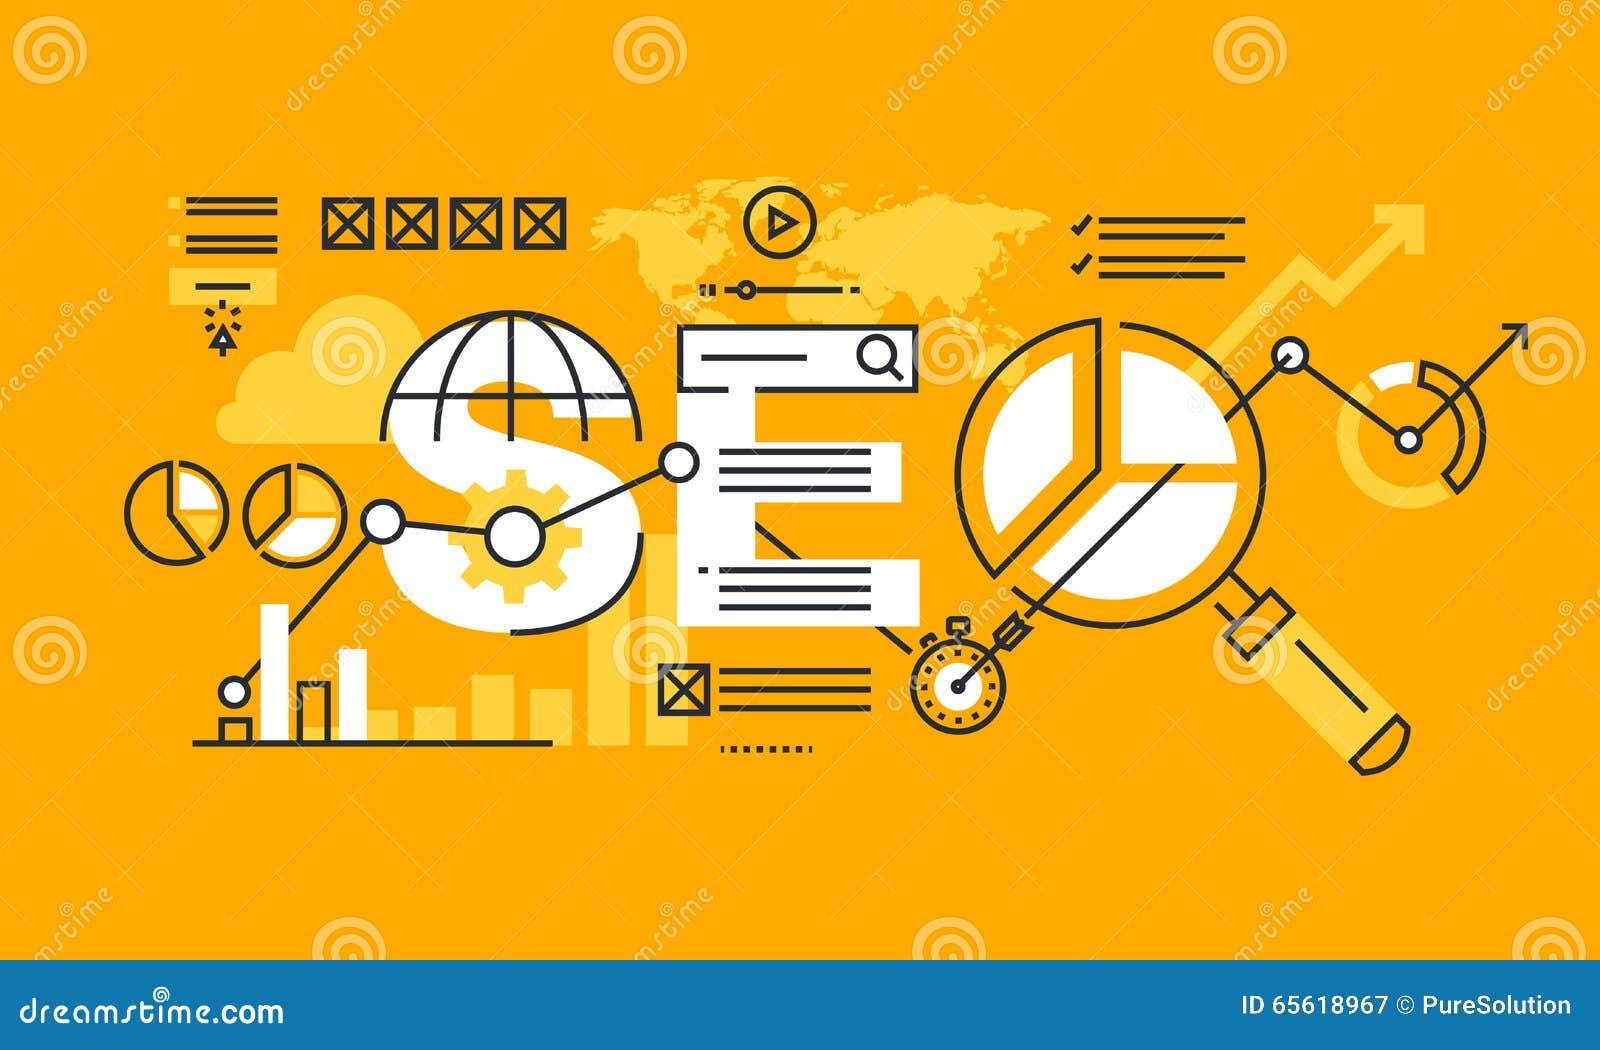 Search engine optimization | Etsy